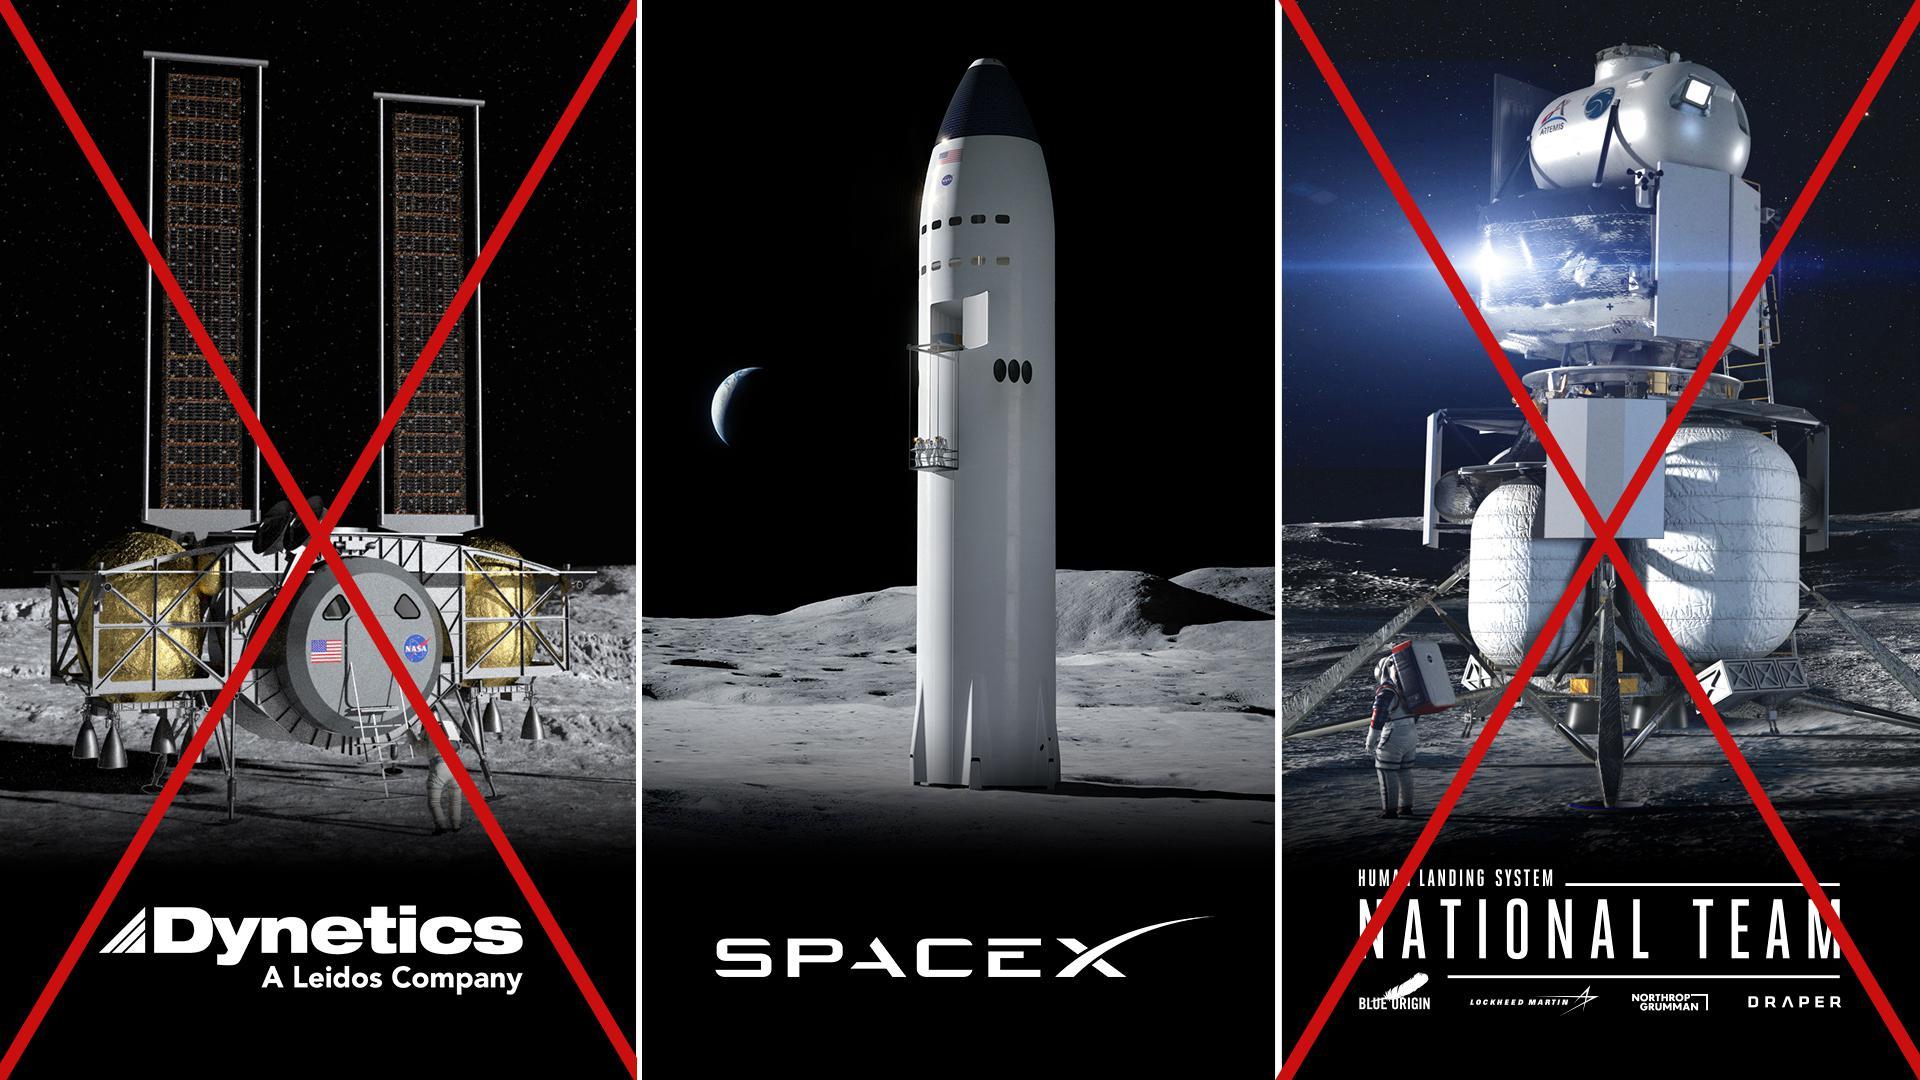 Dynetics SpaceX Blue Origin Natl Team HLS landers (NASA) 1 downselect